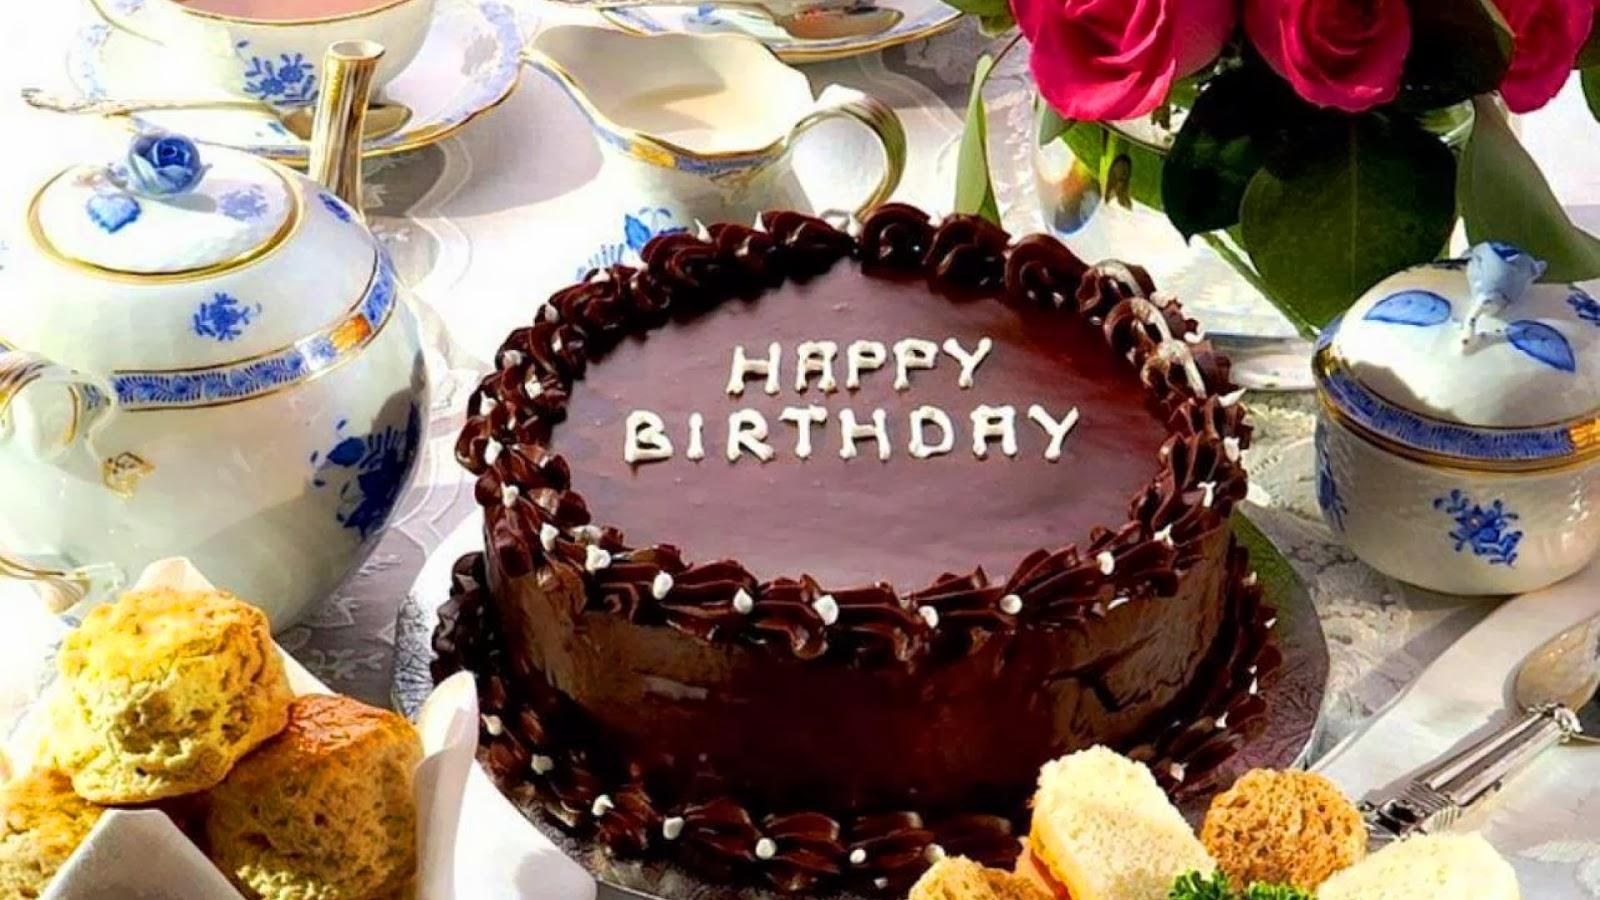 Love Birthday Cake Hd Images : Chocolate Cake Wallpaper - WallpaperSafari